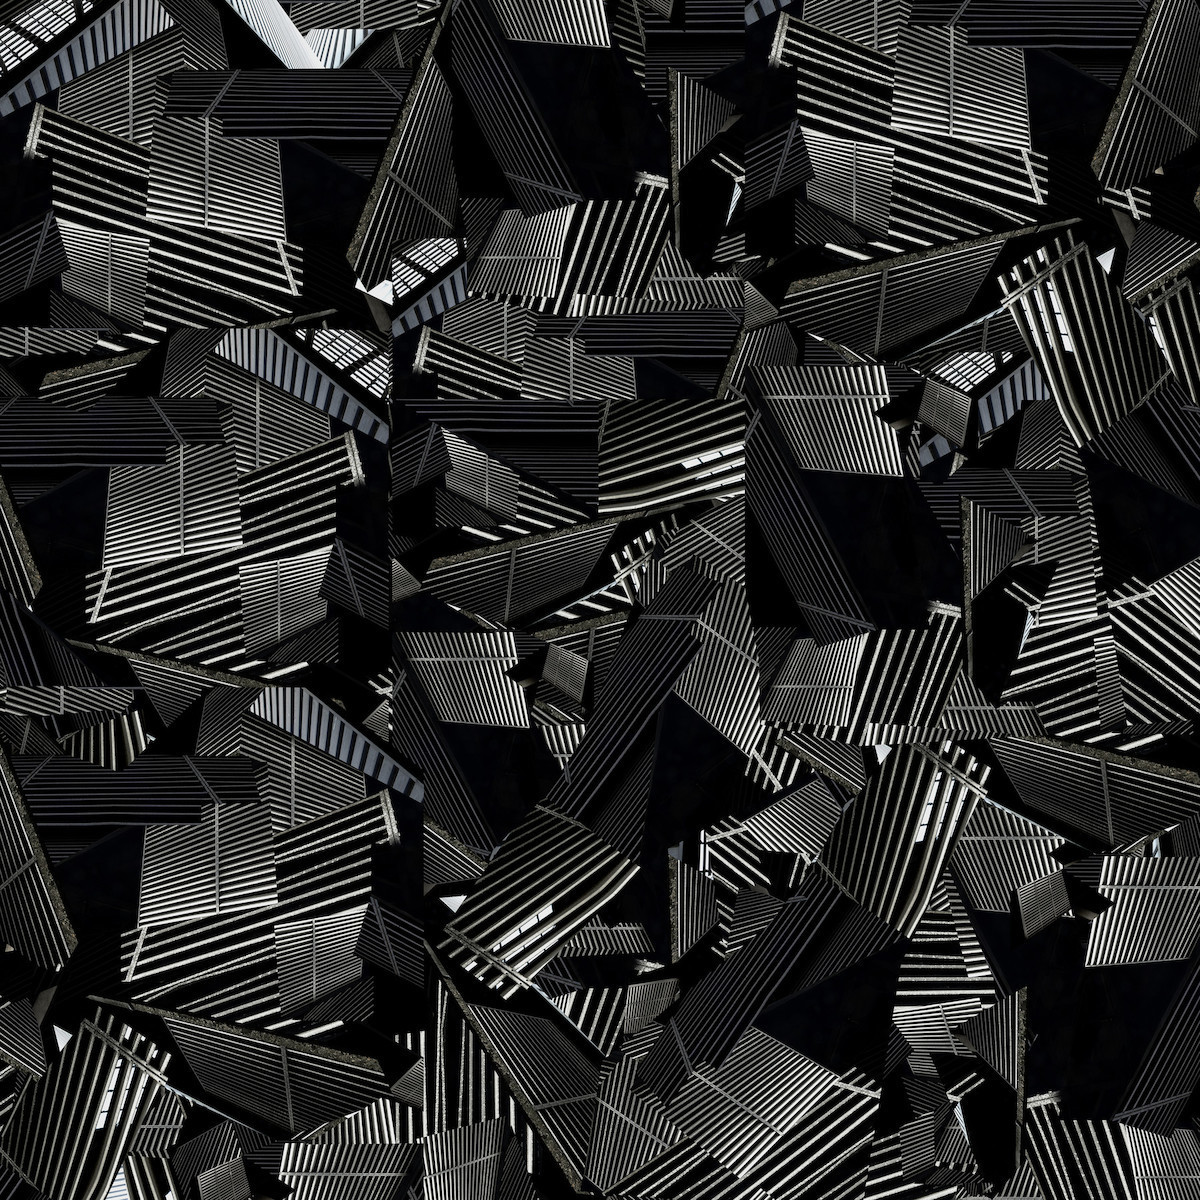 Steve Sabella - Metamorphosis, 2012 | Contemporary Art Platform, Kuwait